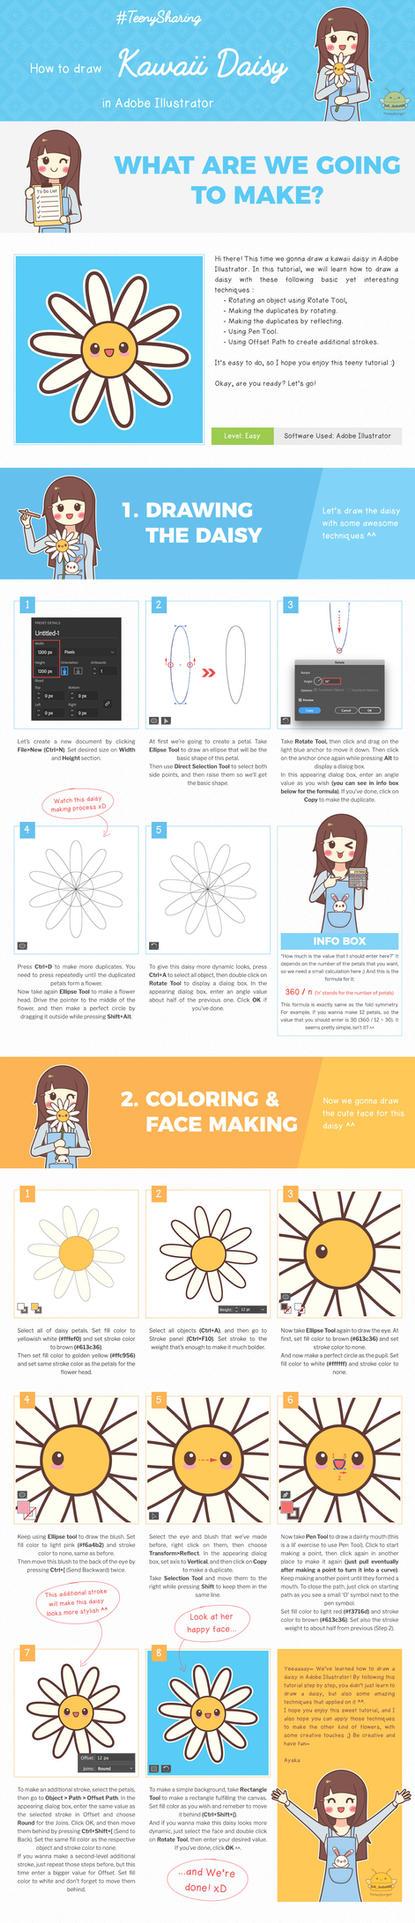 How to Draw Kawaii Daisy by honeyburger